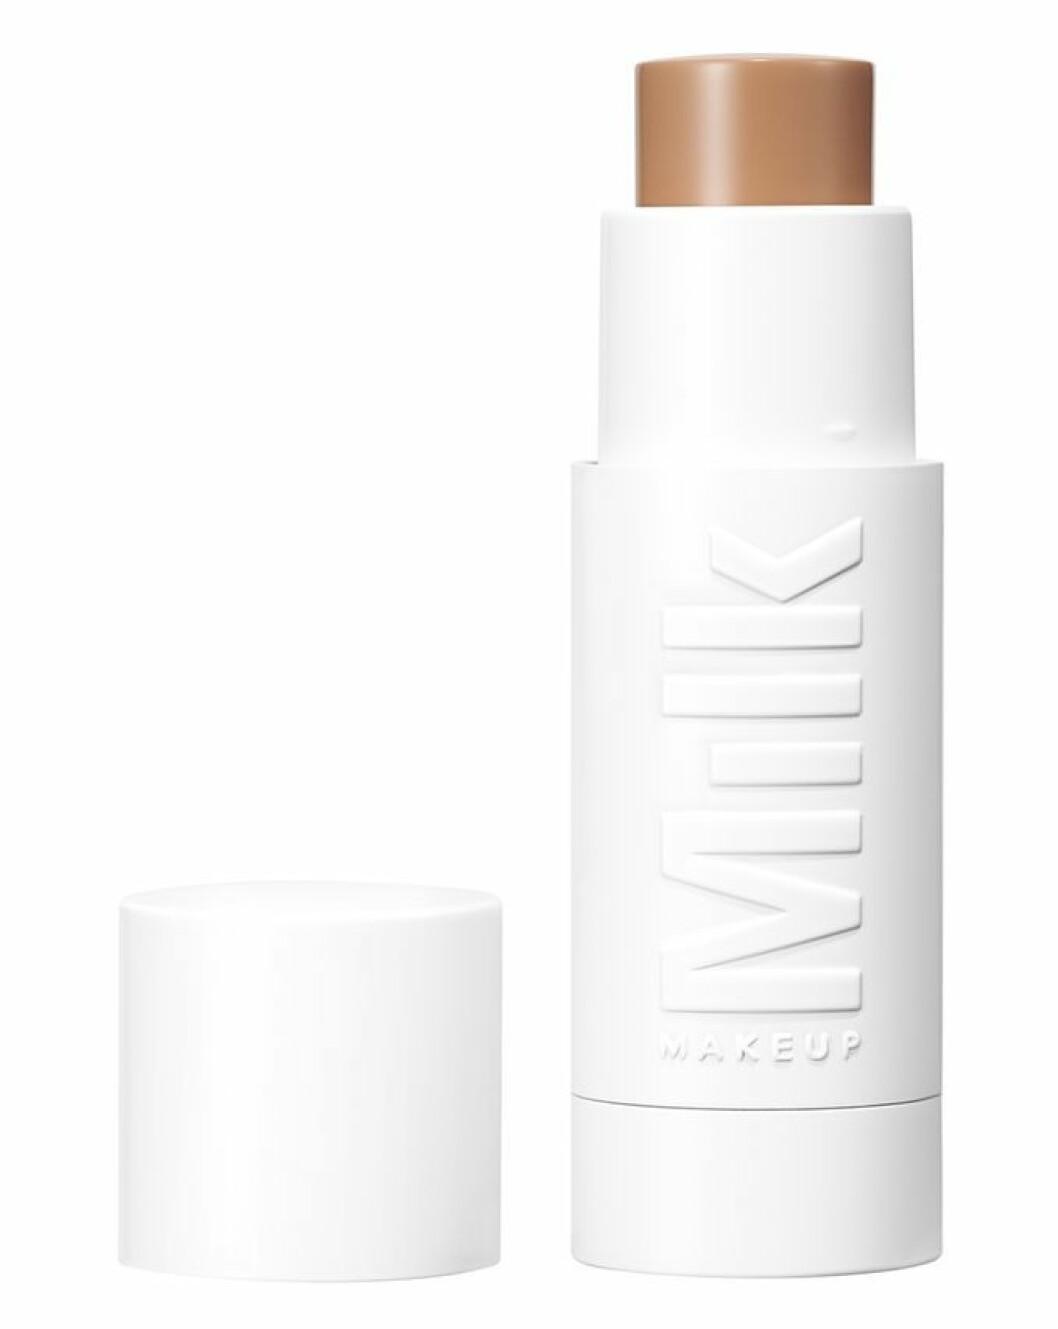 Foundation stick milk makeup